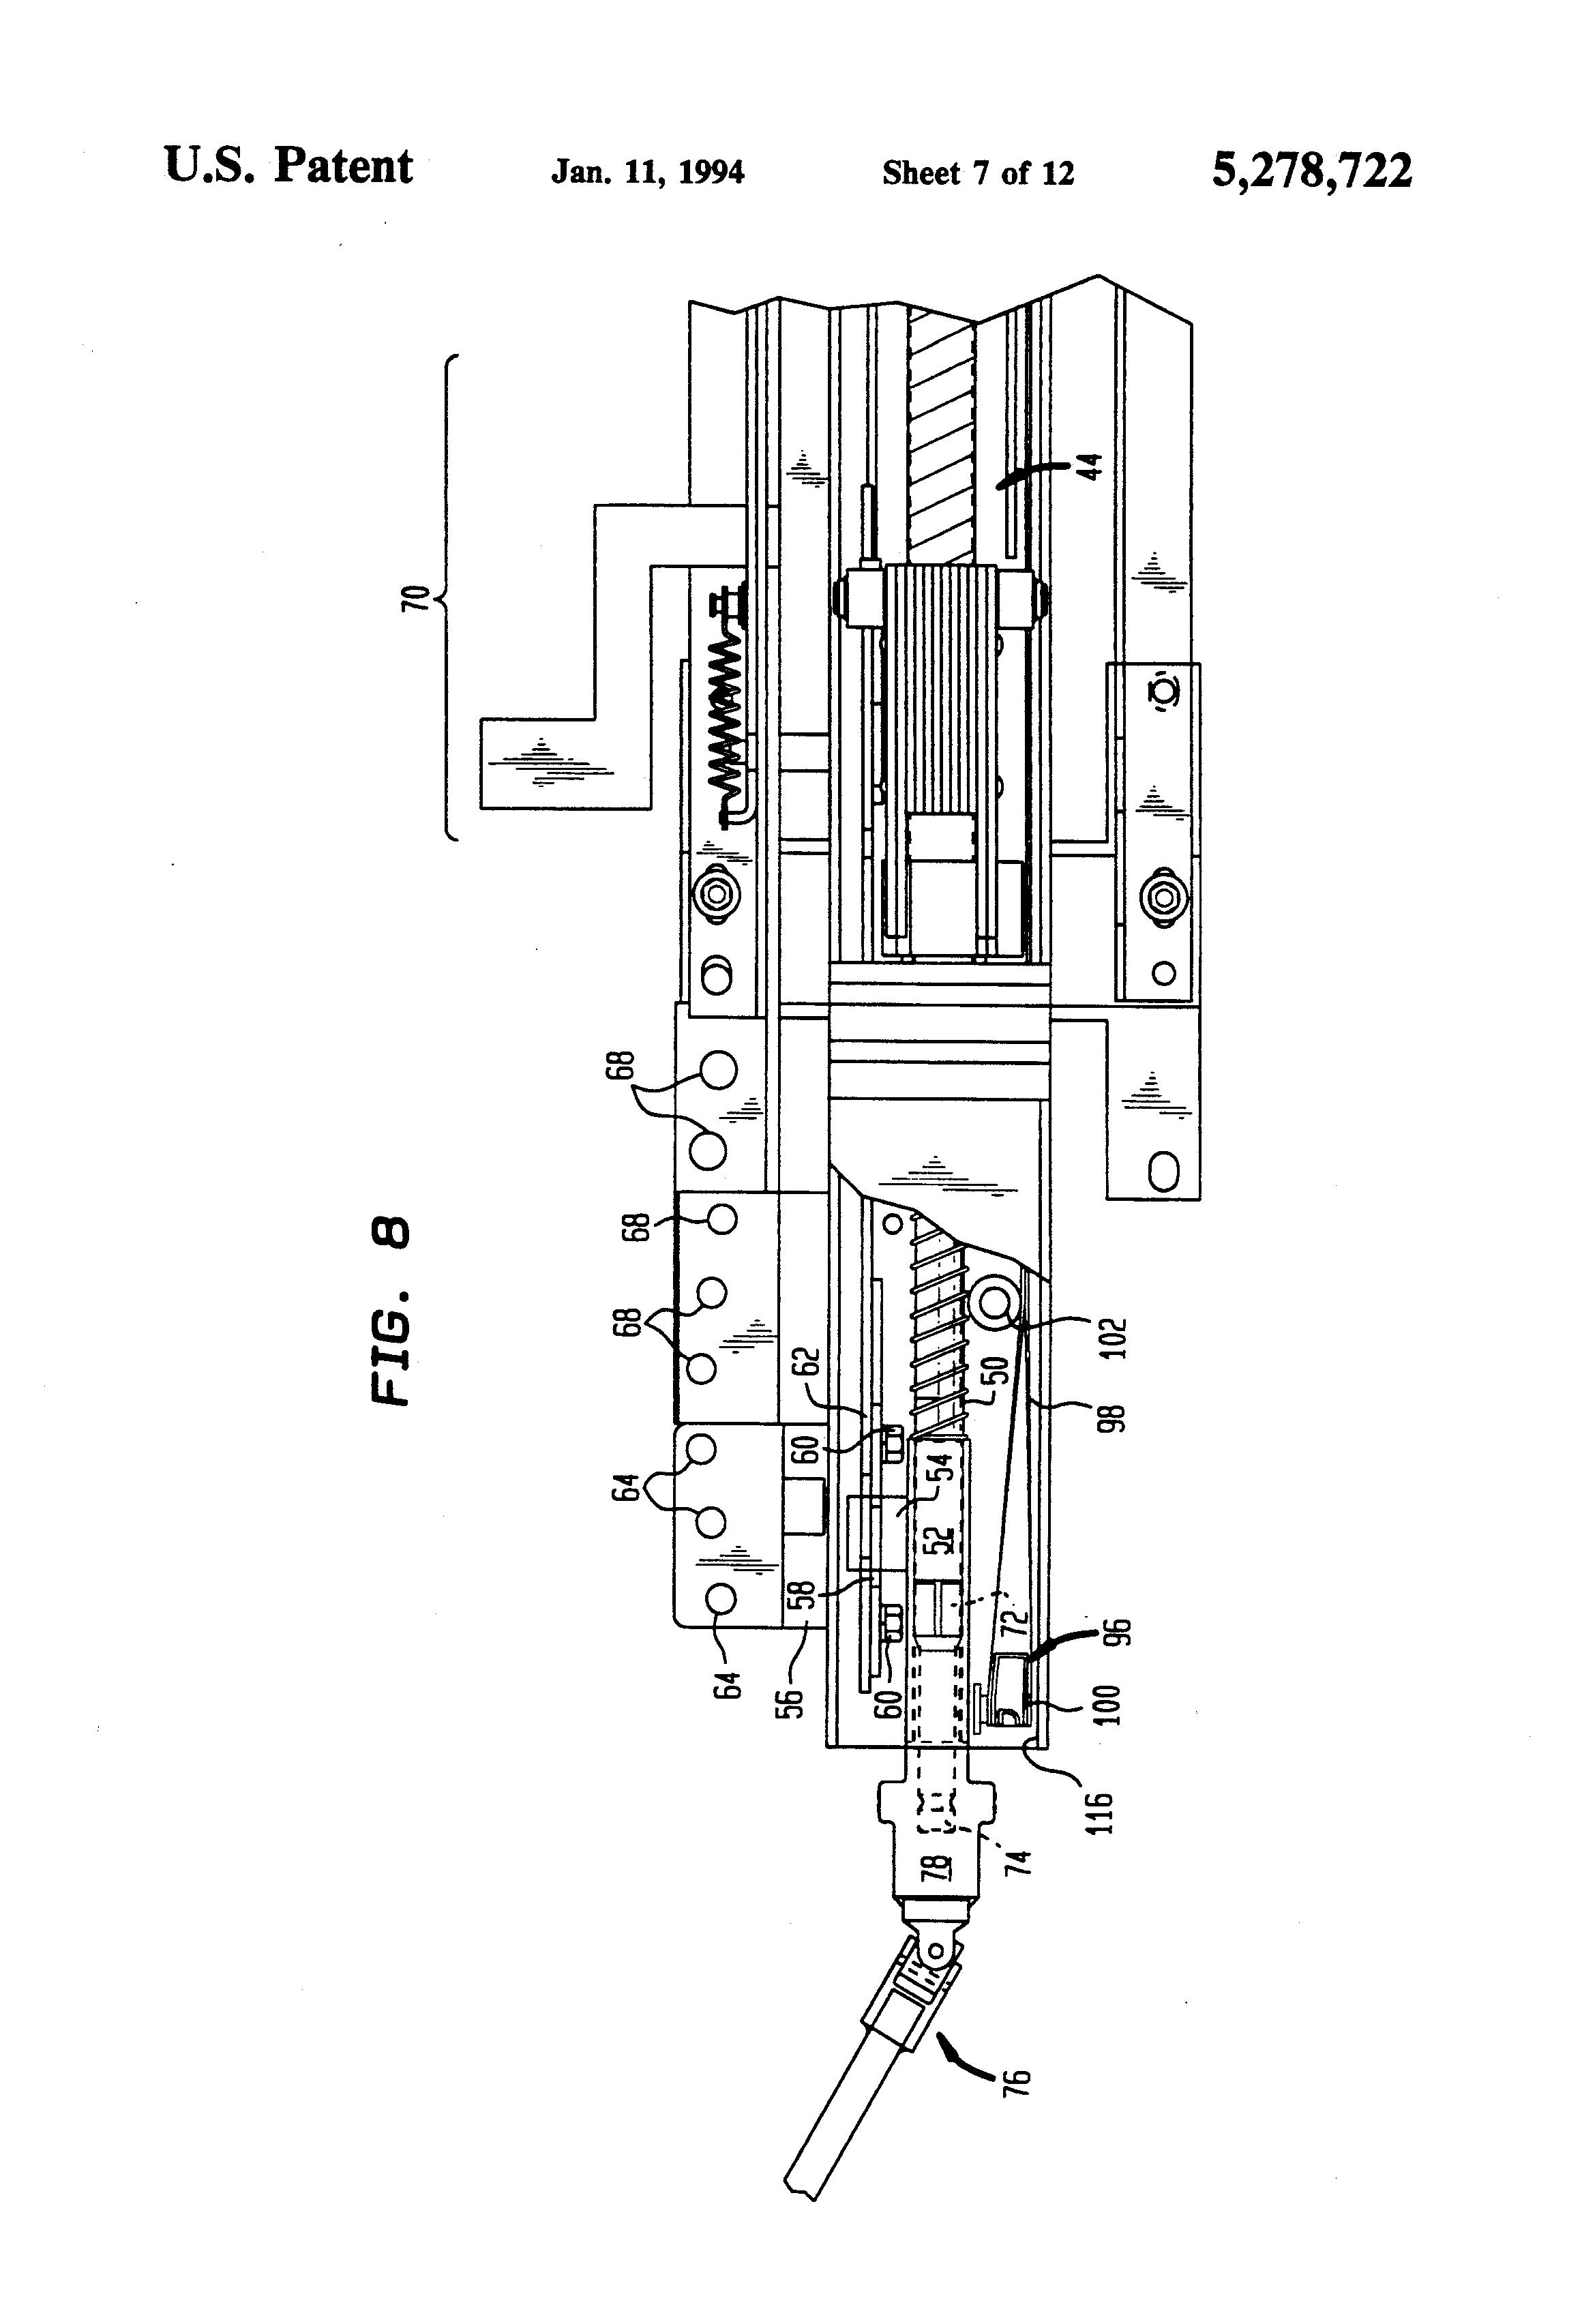 VR_5641] 2003 Ford E450 Fuse Diagram Wiring DiagramDogan Llonu Unho Papxe Mohammedshrine Librar Wiring 101